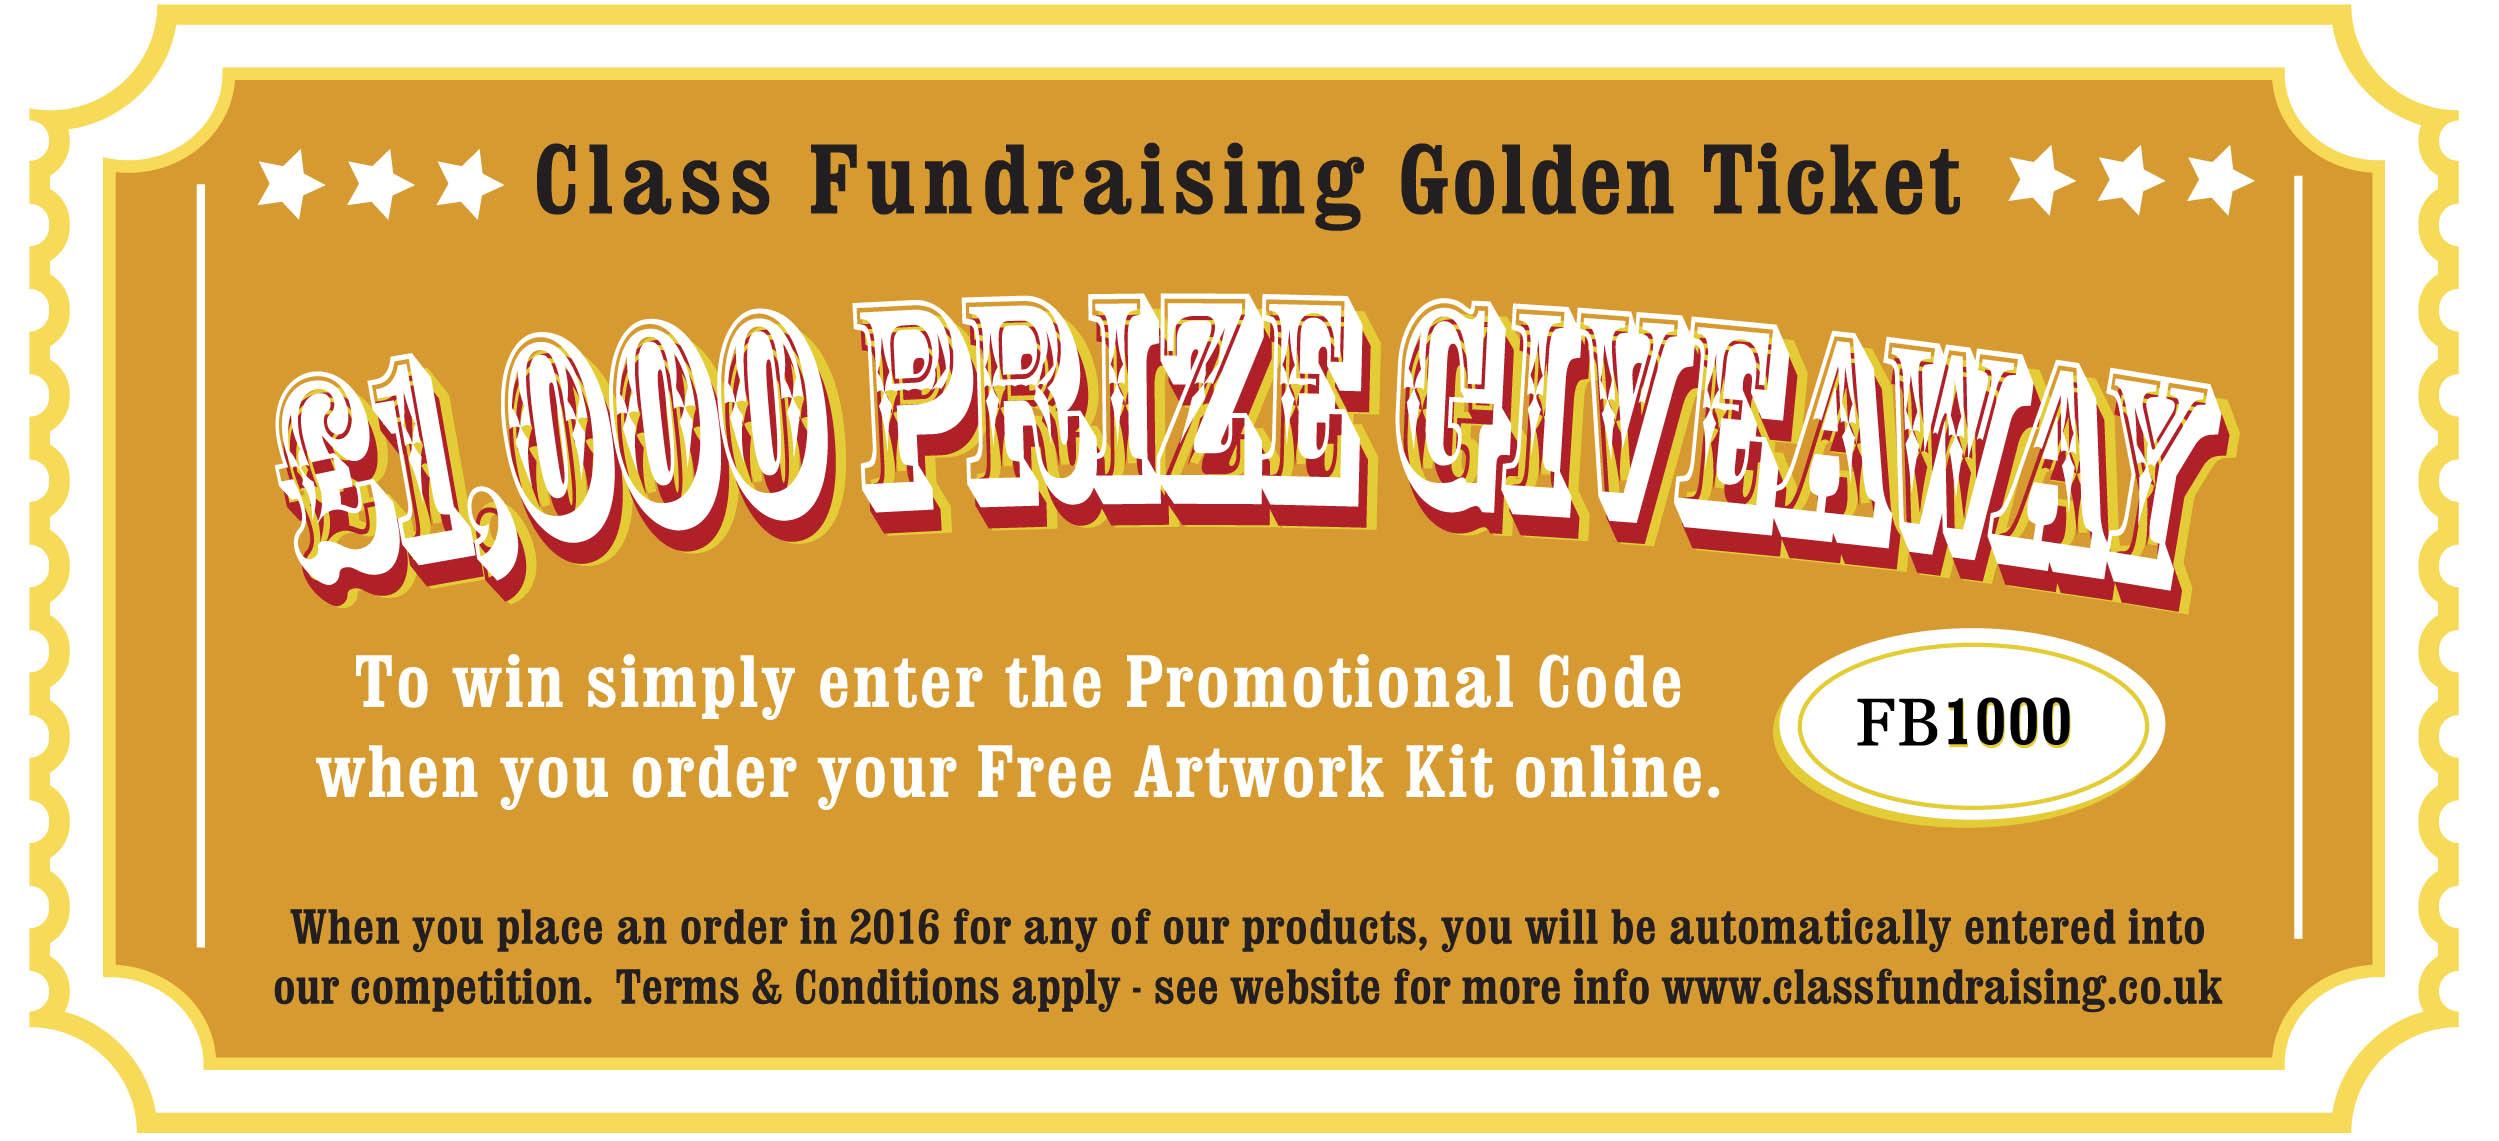 fb-golden-ticket-mailshot-2016